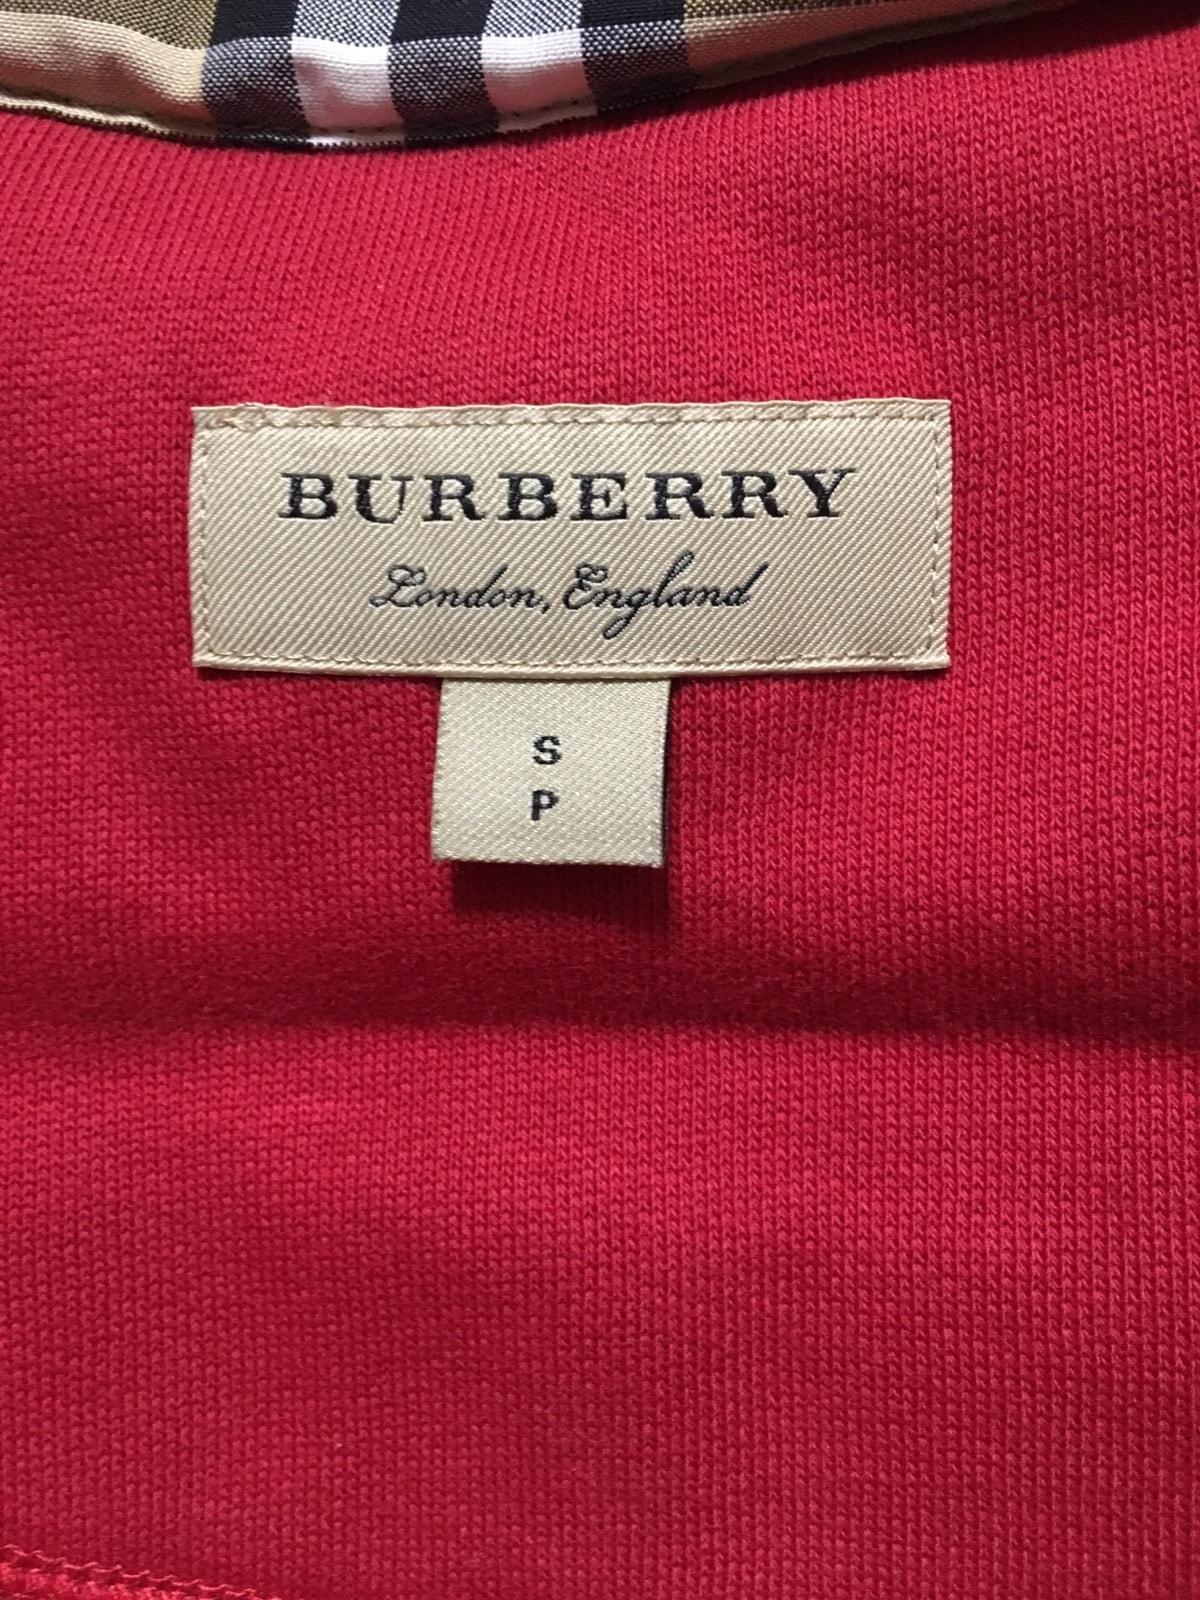 Burberry(バーバリー)のパーカー